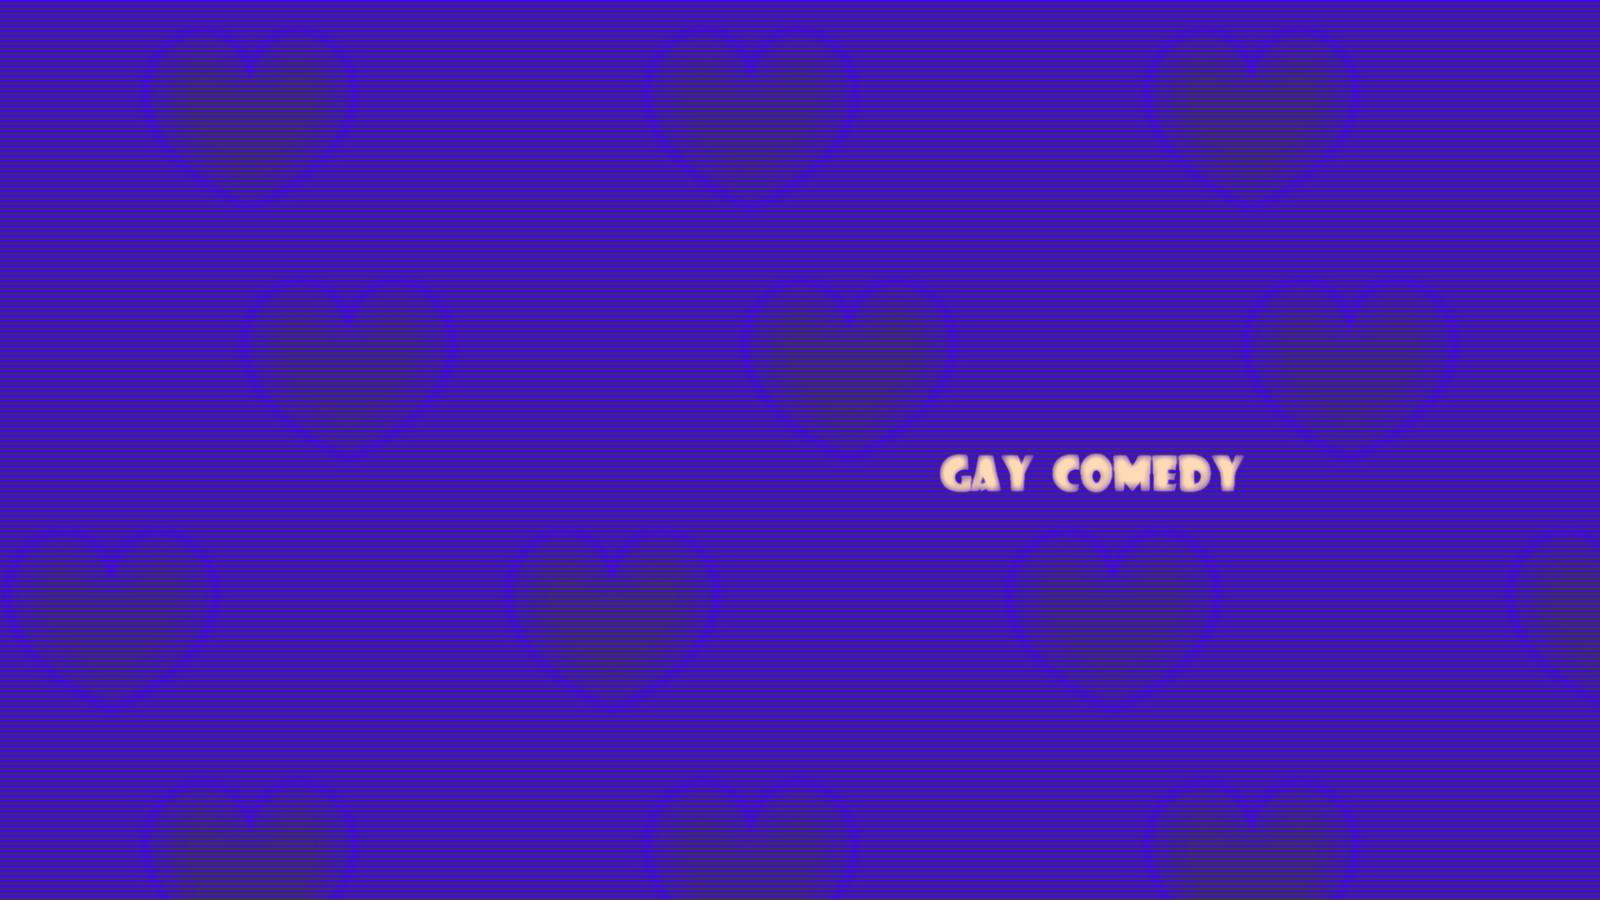 LGBTWALLPAPERSGAYLESBIANPRIDERAINBOWGAYCOMEDY3png 1600x900